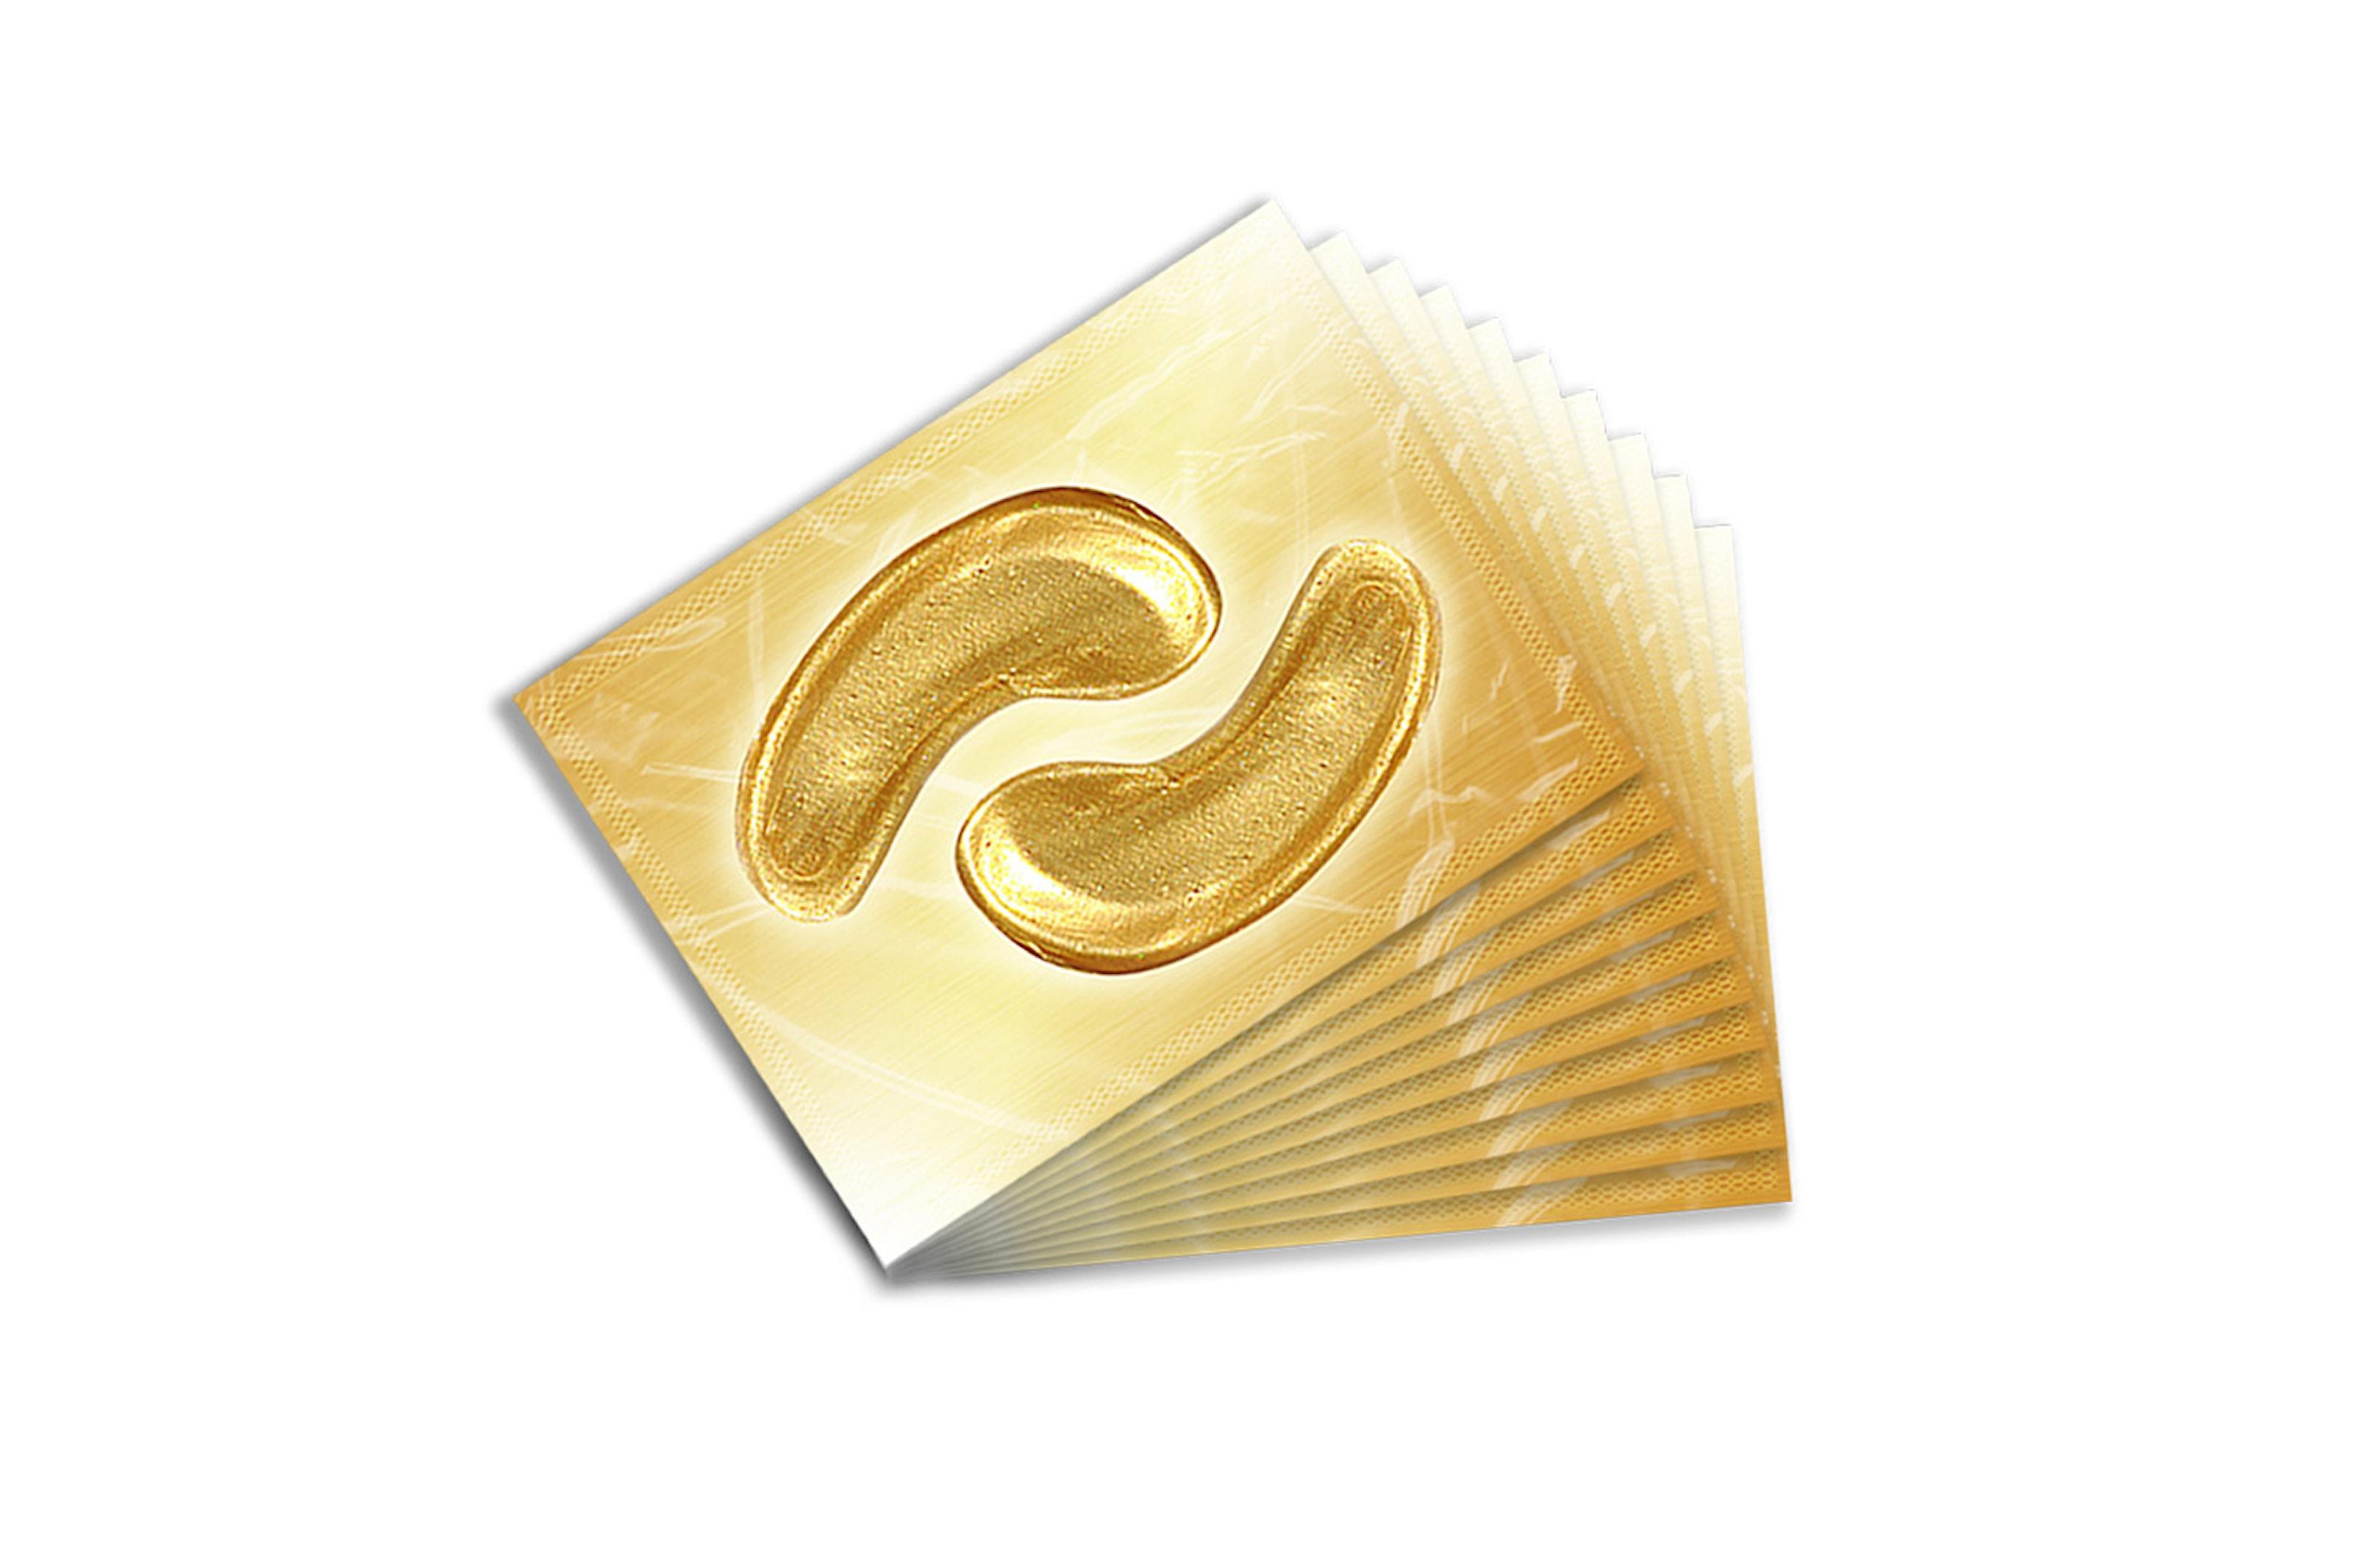 Ögonsmask guld med kollagen, 40-pack